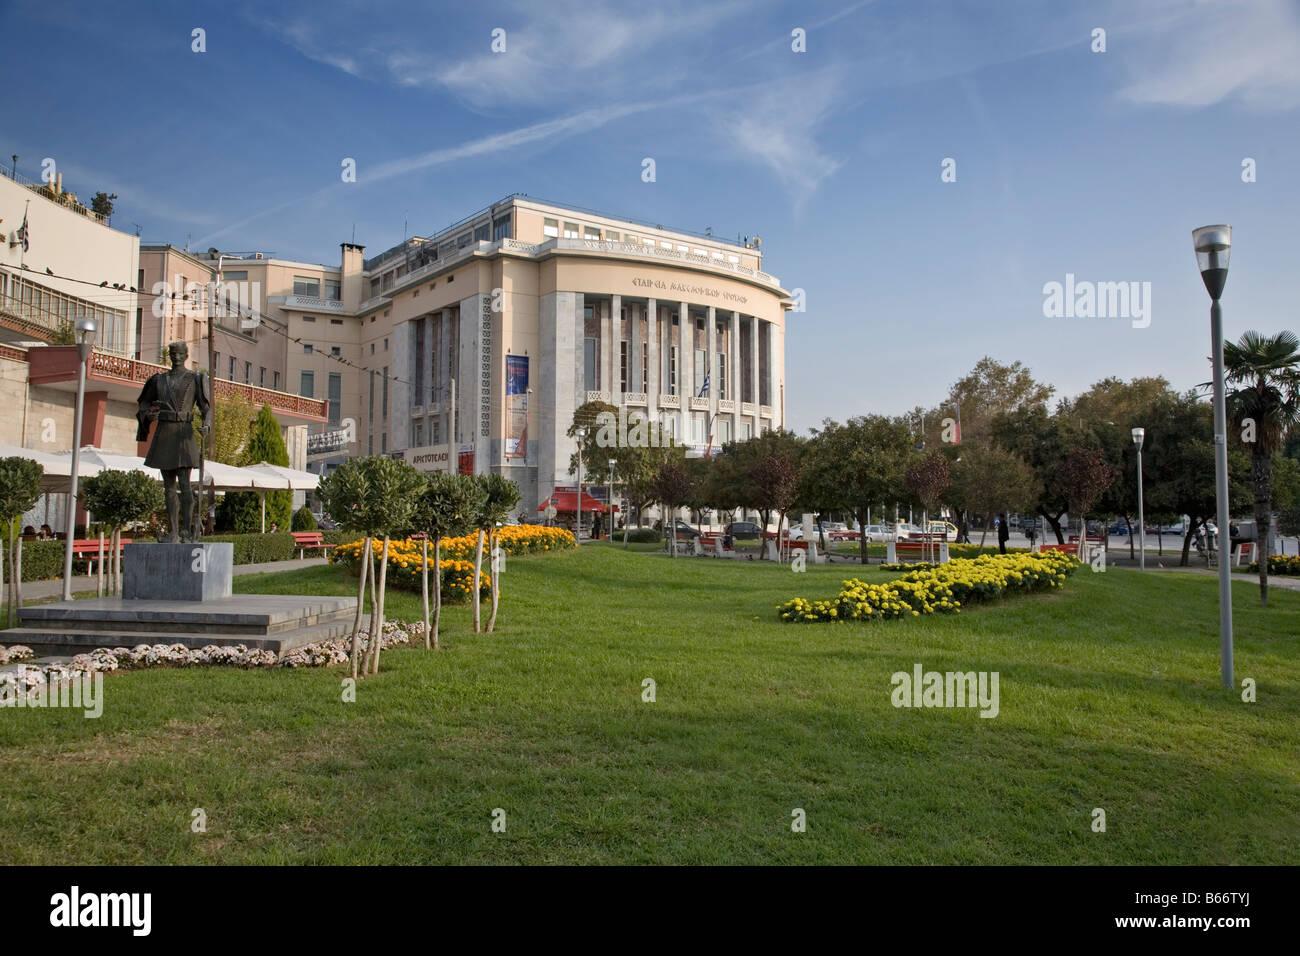 Macedonian Makedonia Studies Theater building Thessaloniki Greece Europe - Stock Image